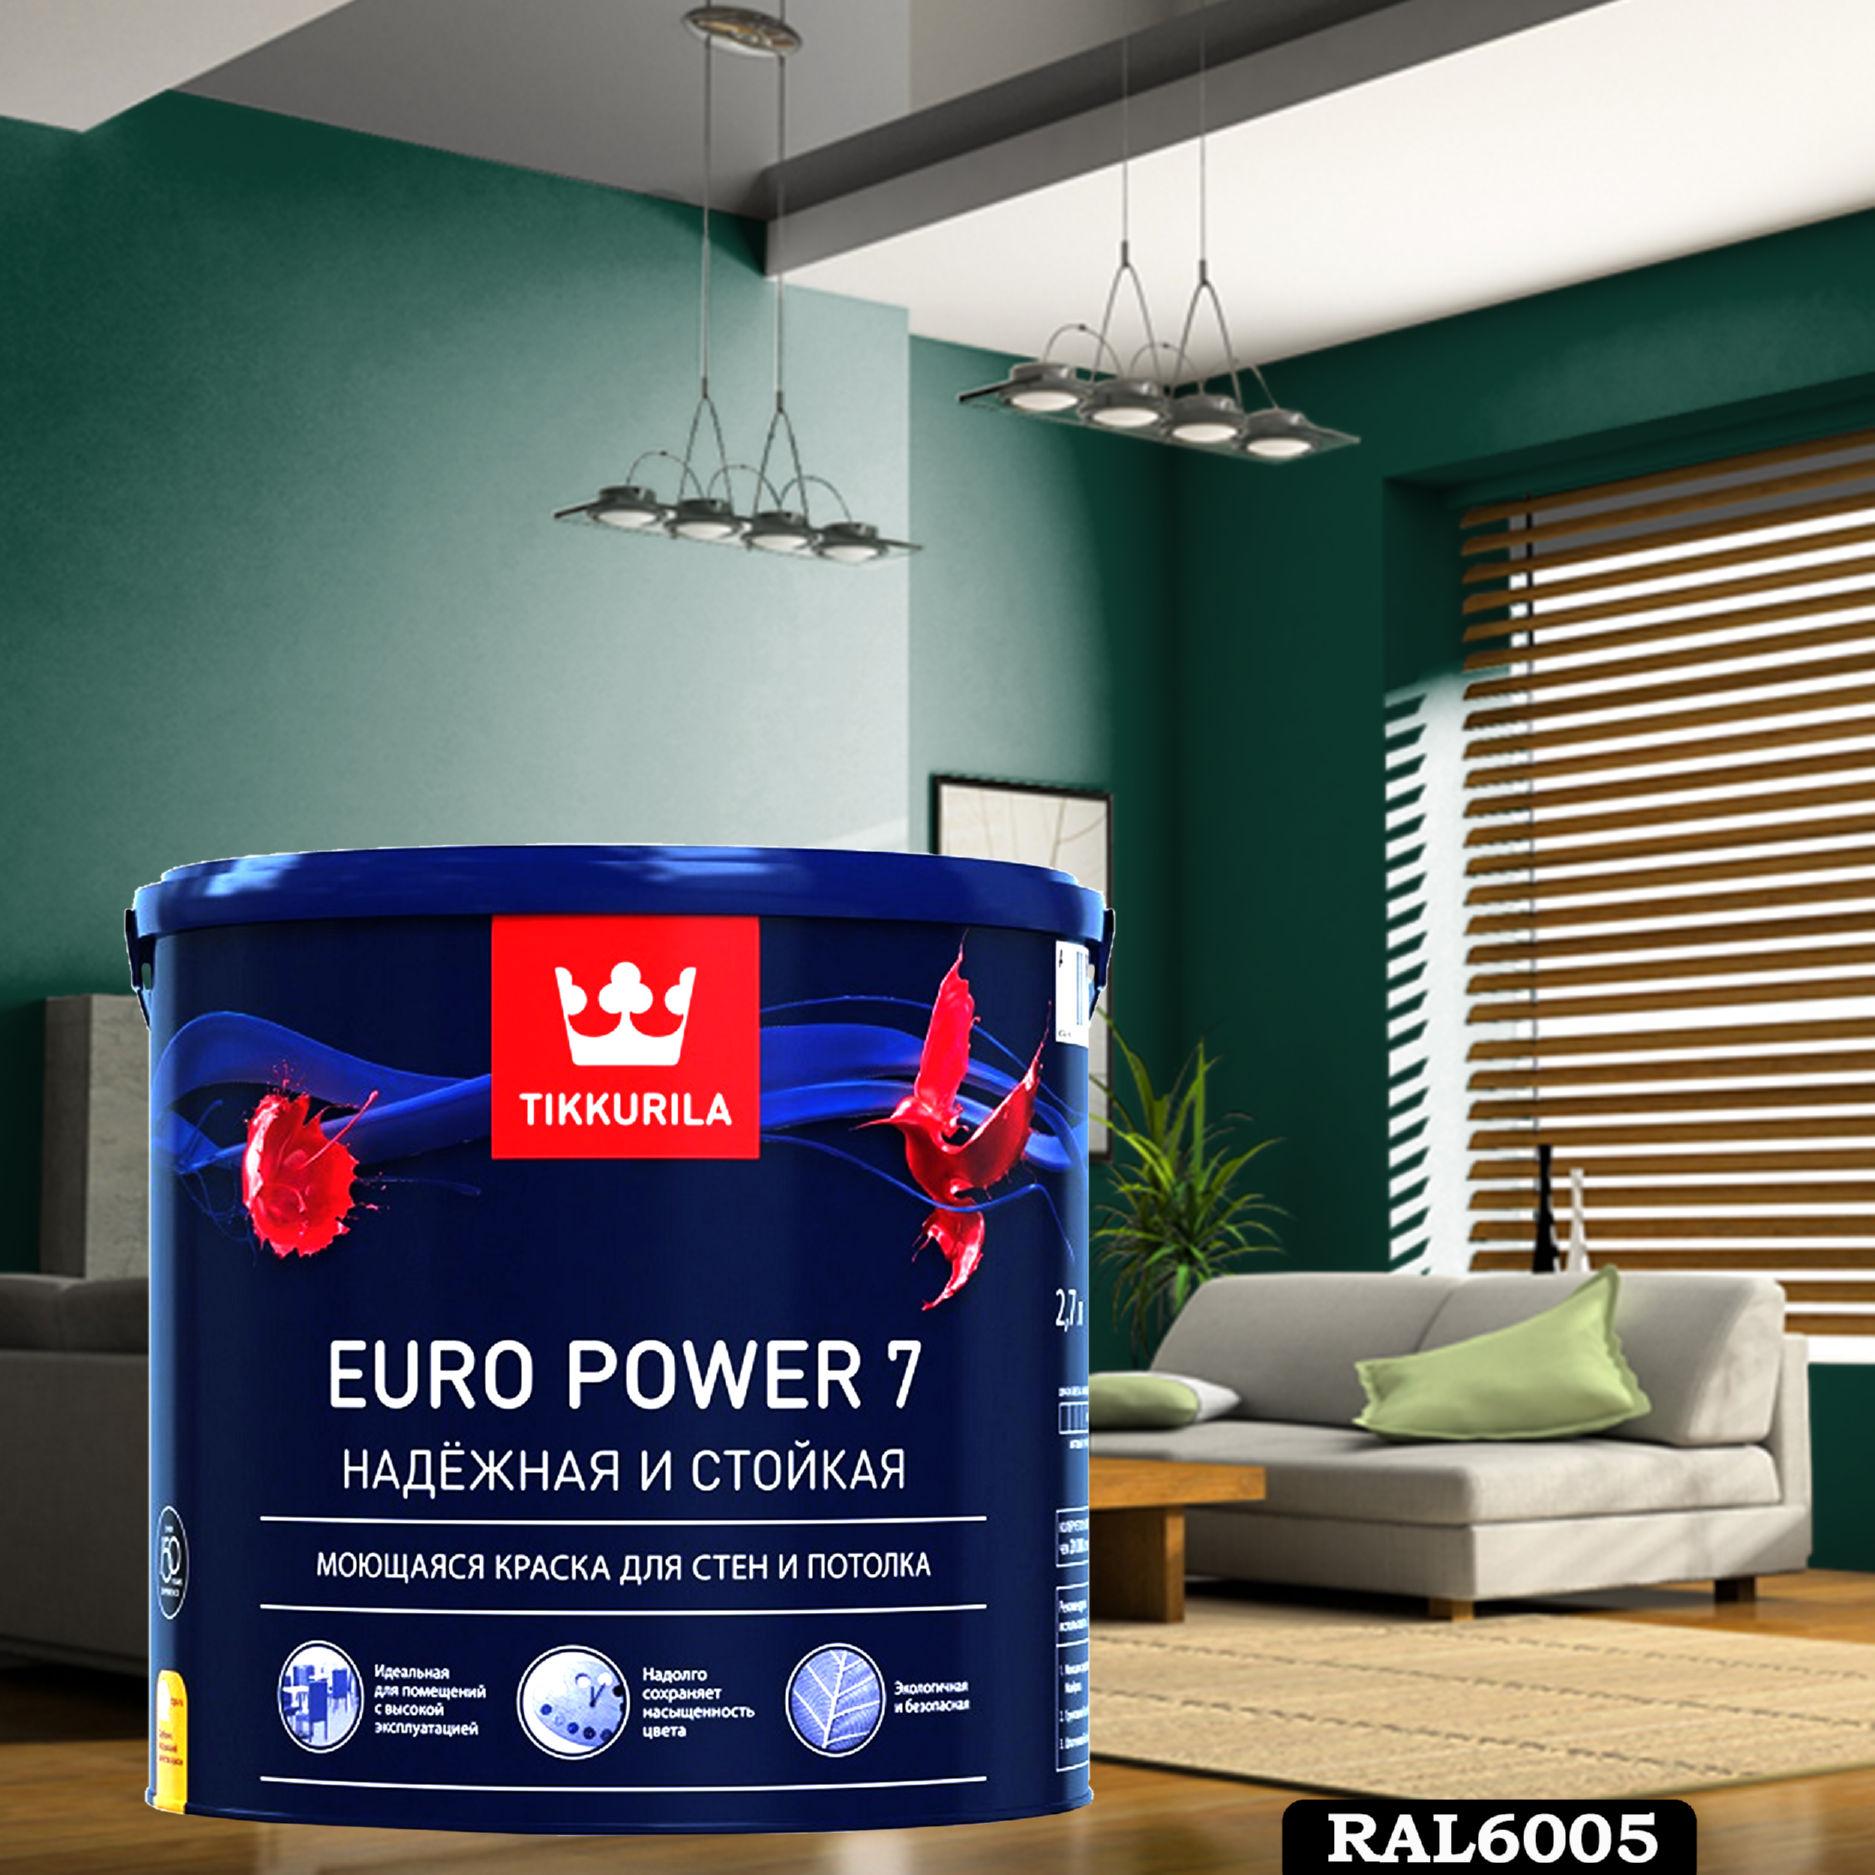 Фото 6 - Краска TIKKURILA Euro Power 7,  RAL 6005 Зеленый-мох, латексная моющаяся матовая интерьерная, 9 л.